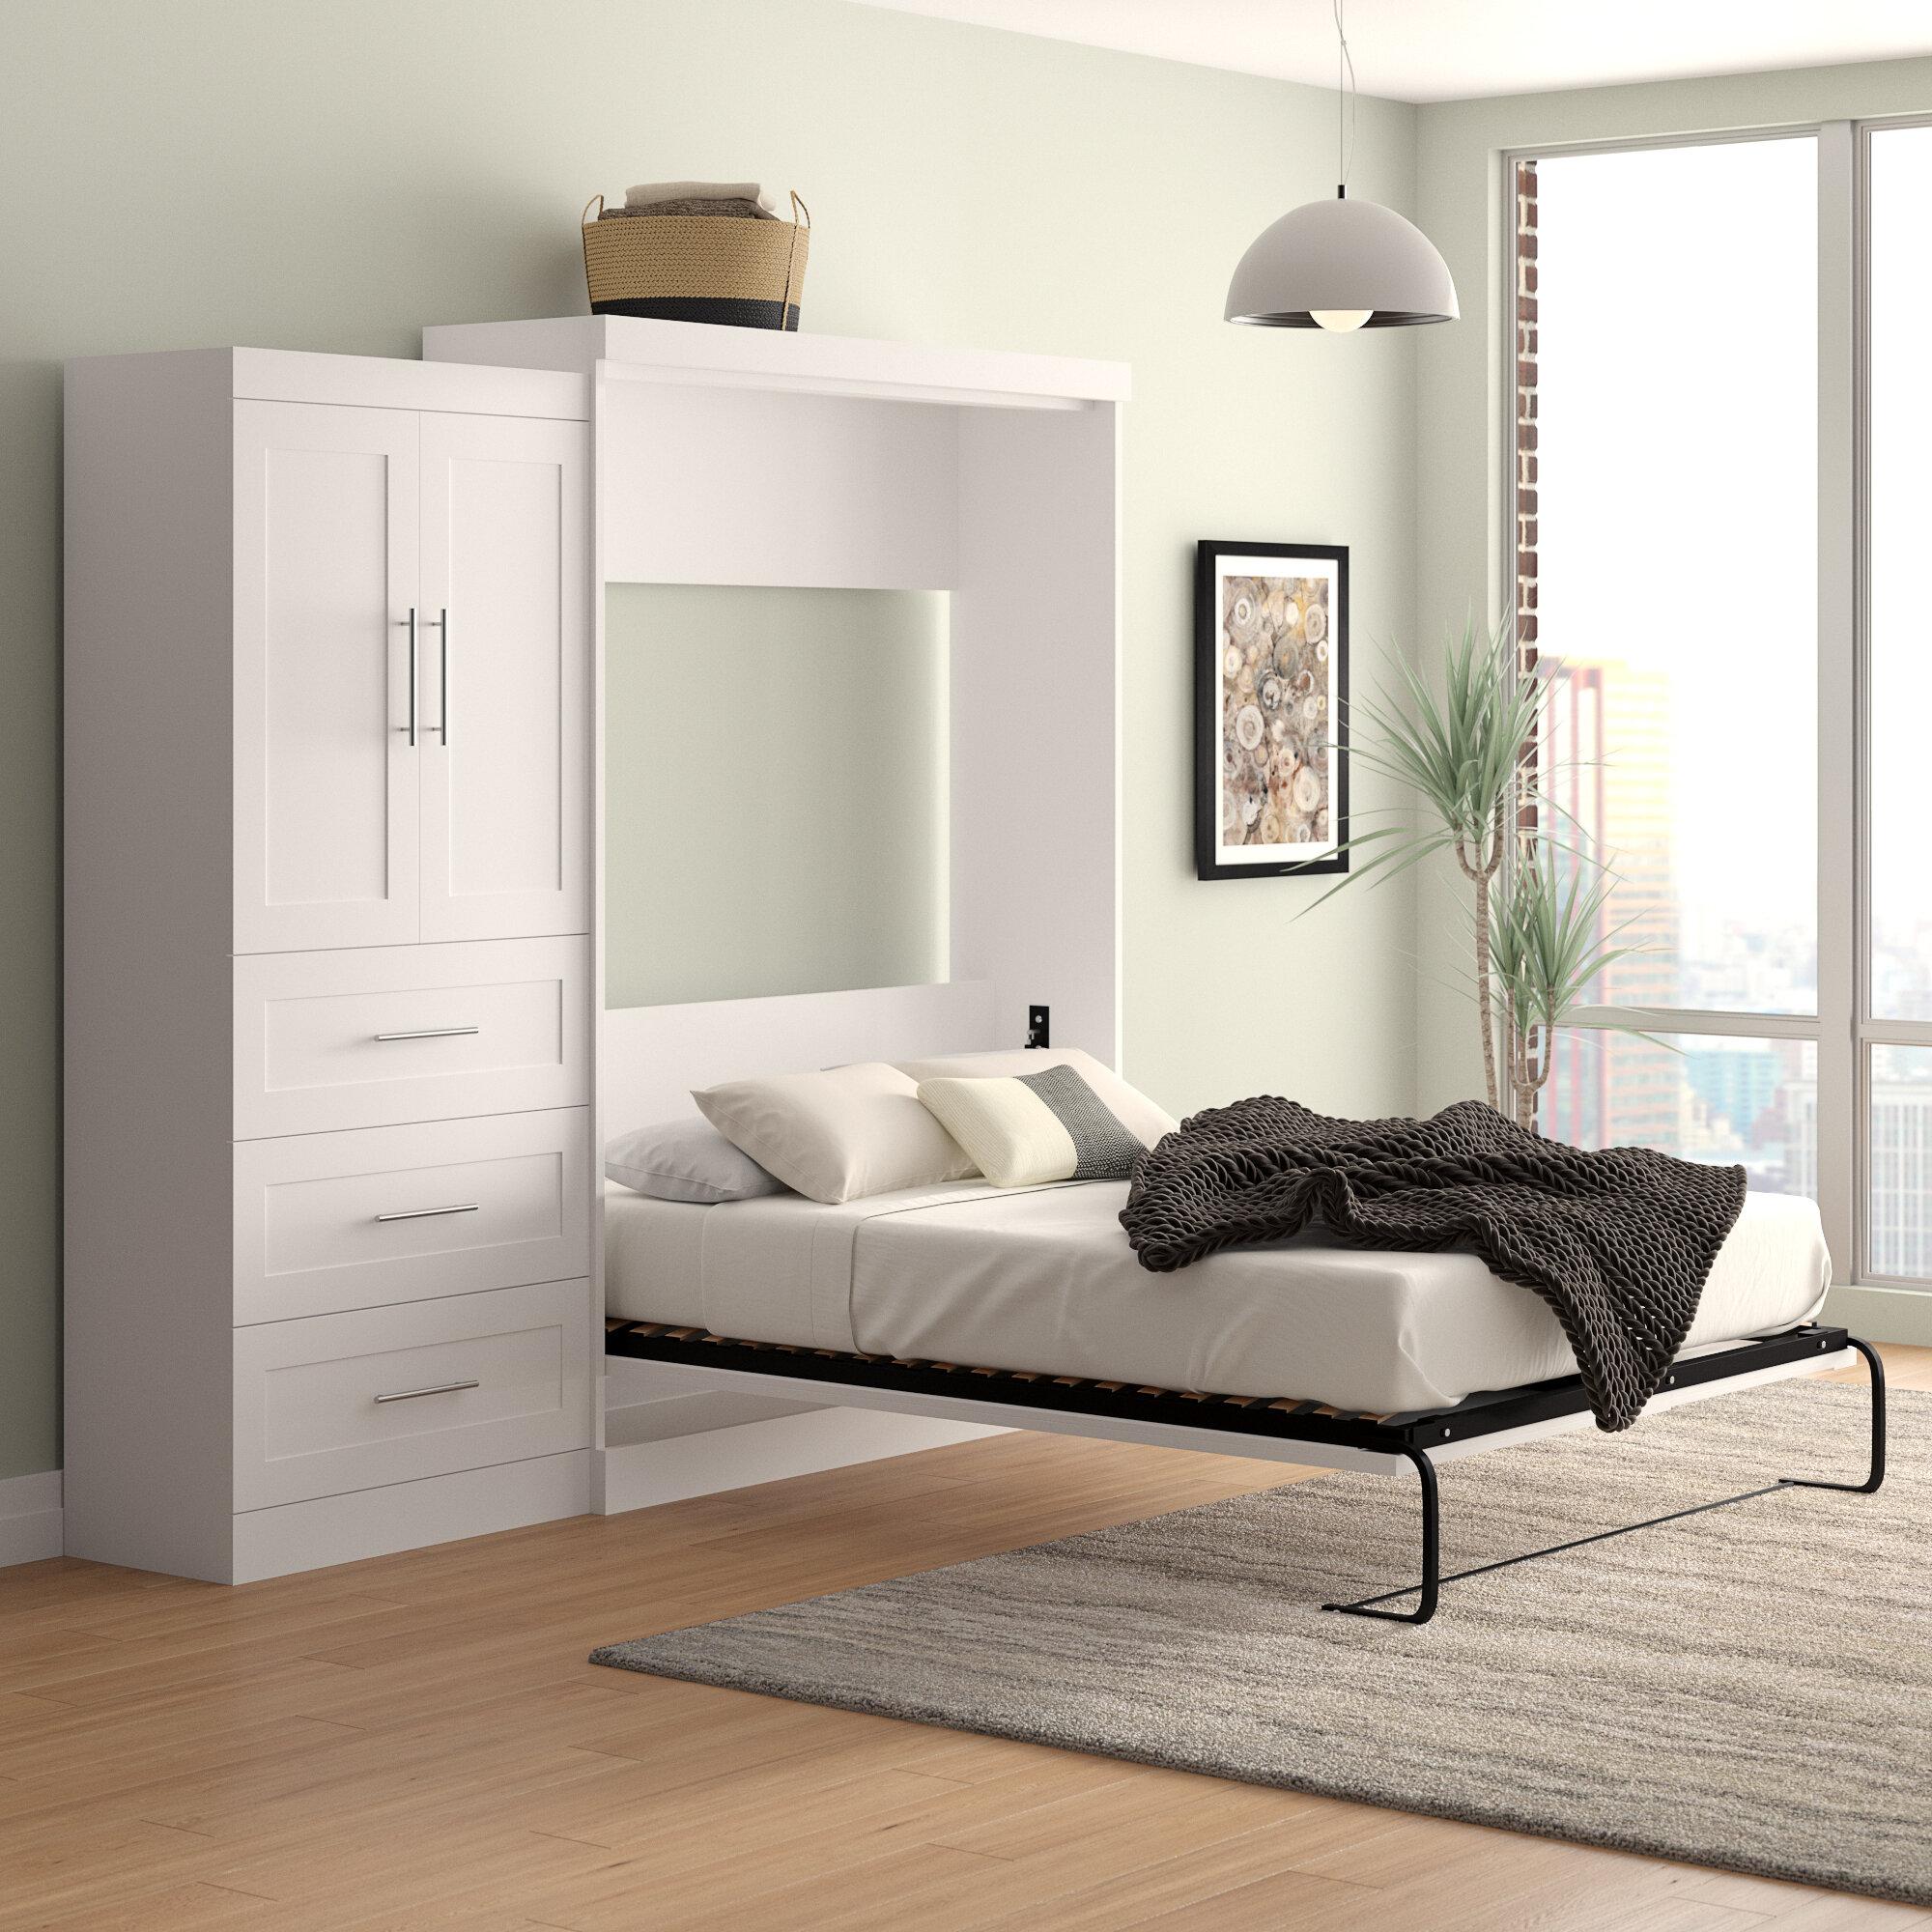 Remarkable Latitude Run Shanna Murphy Bed Reviews Wayfair Creativecarmelina Interior Chair Design Creativecarmelinacom